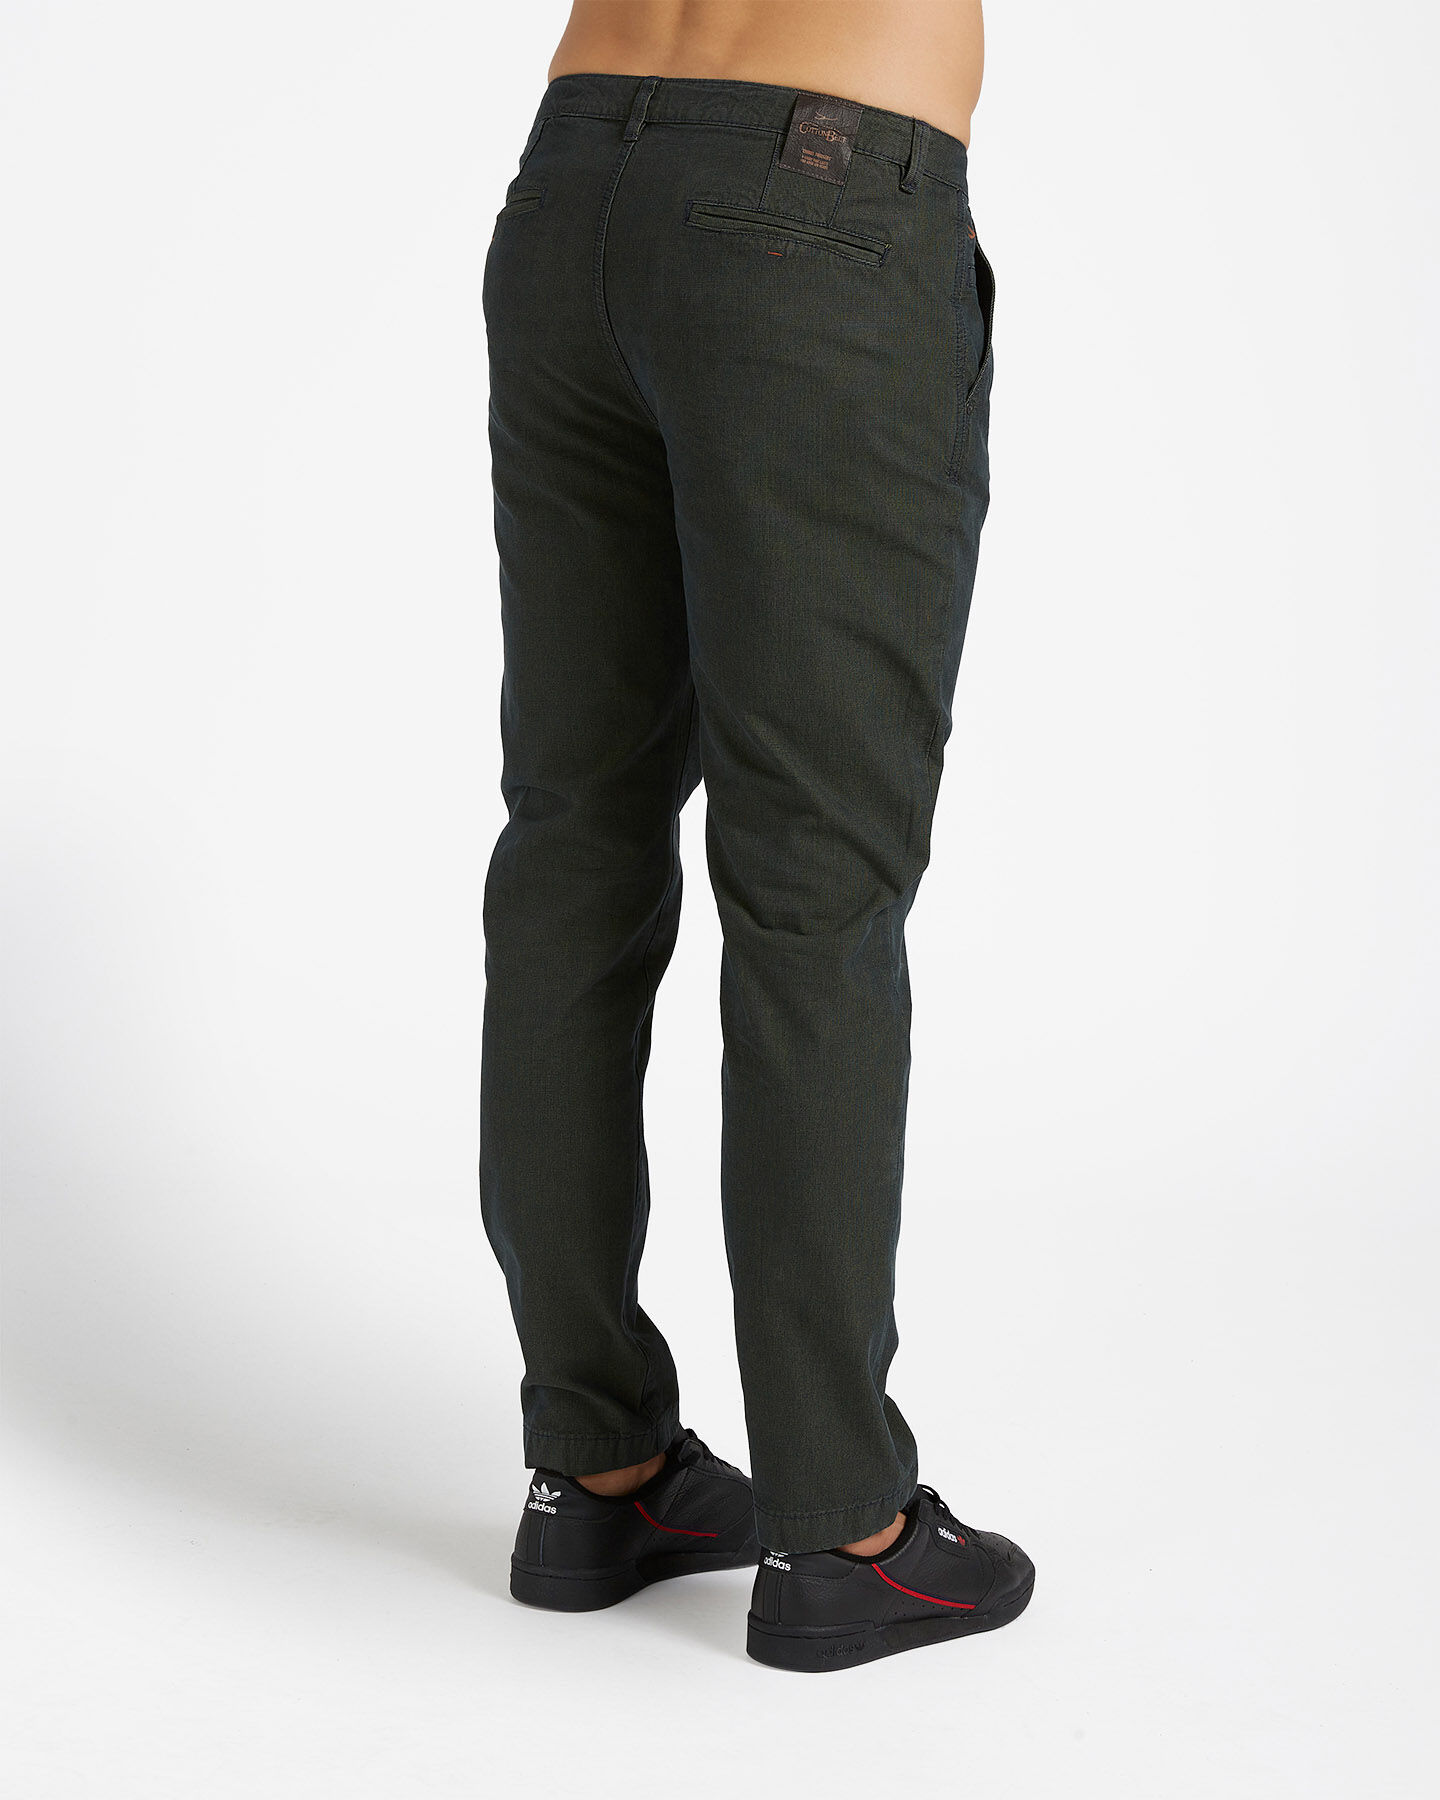 Pantalone COTTON BELT CHINO STRETCH M S4076644 scatto 1